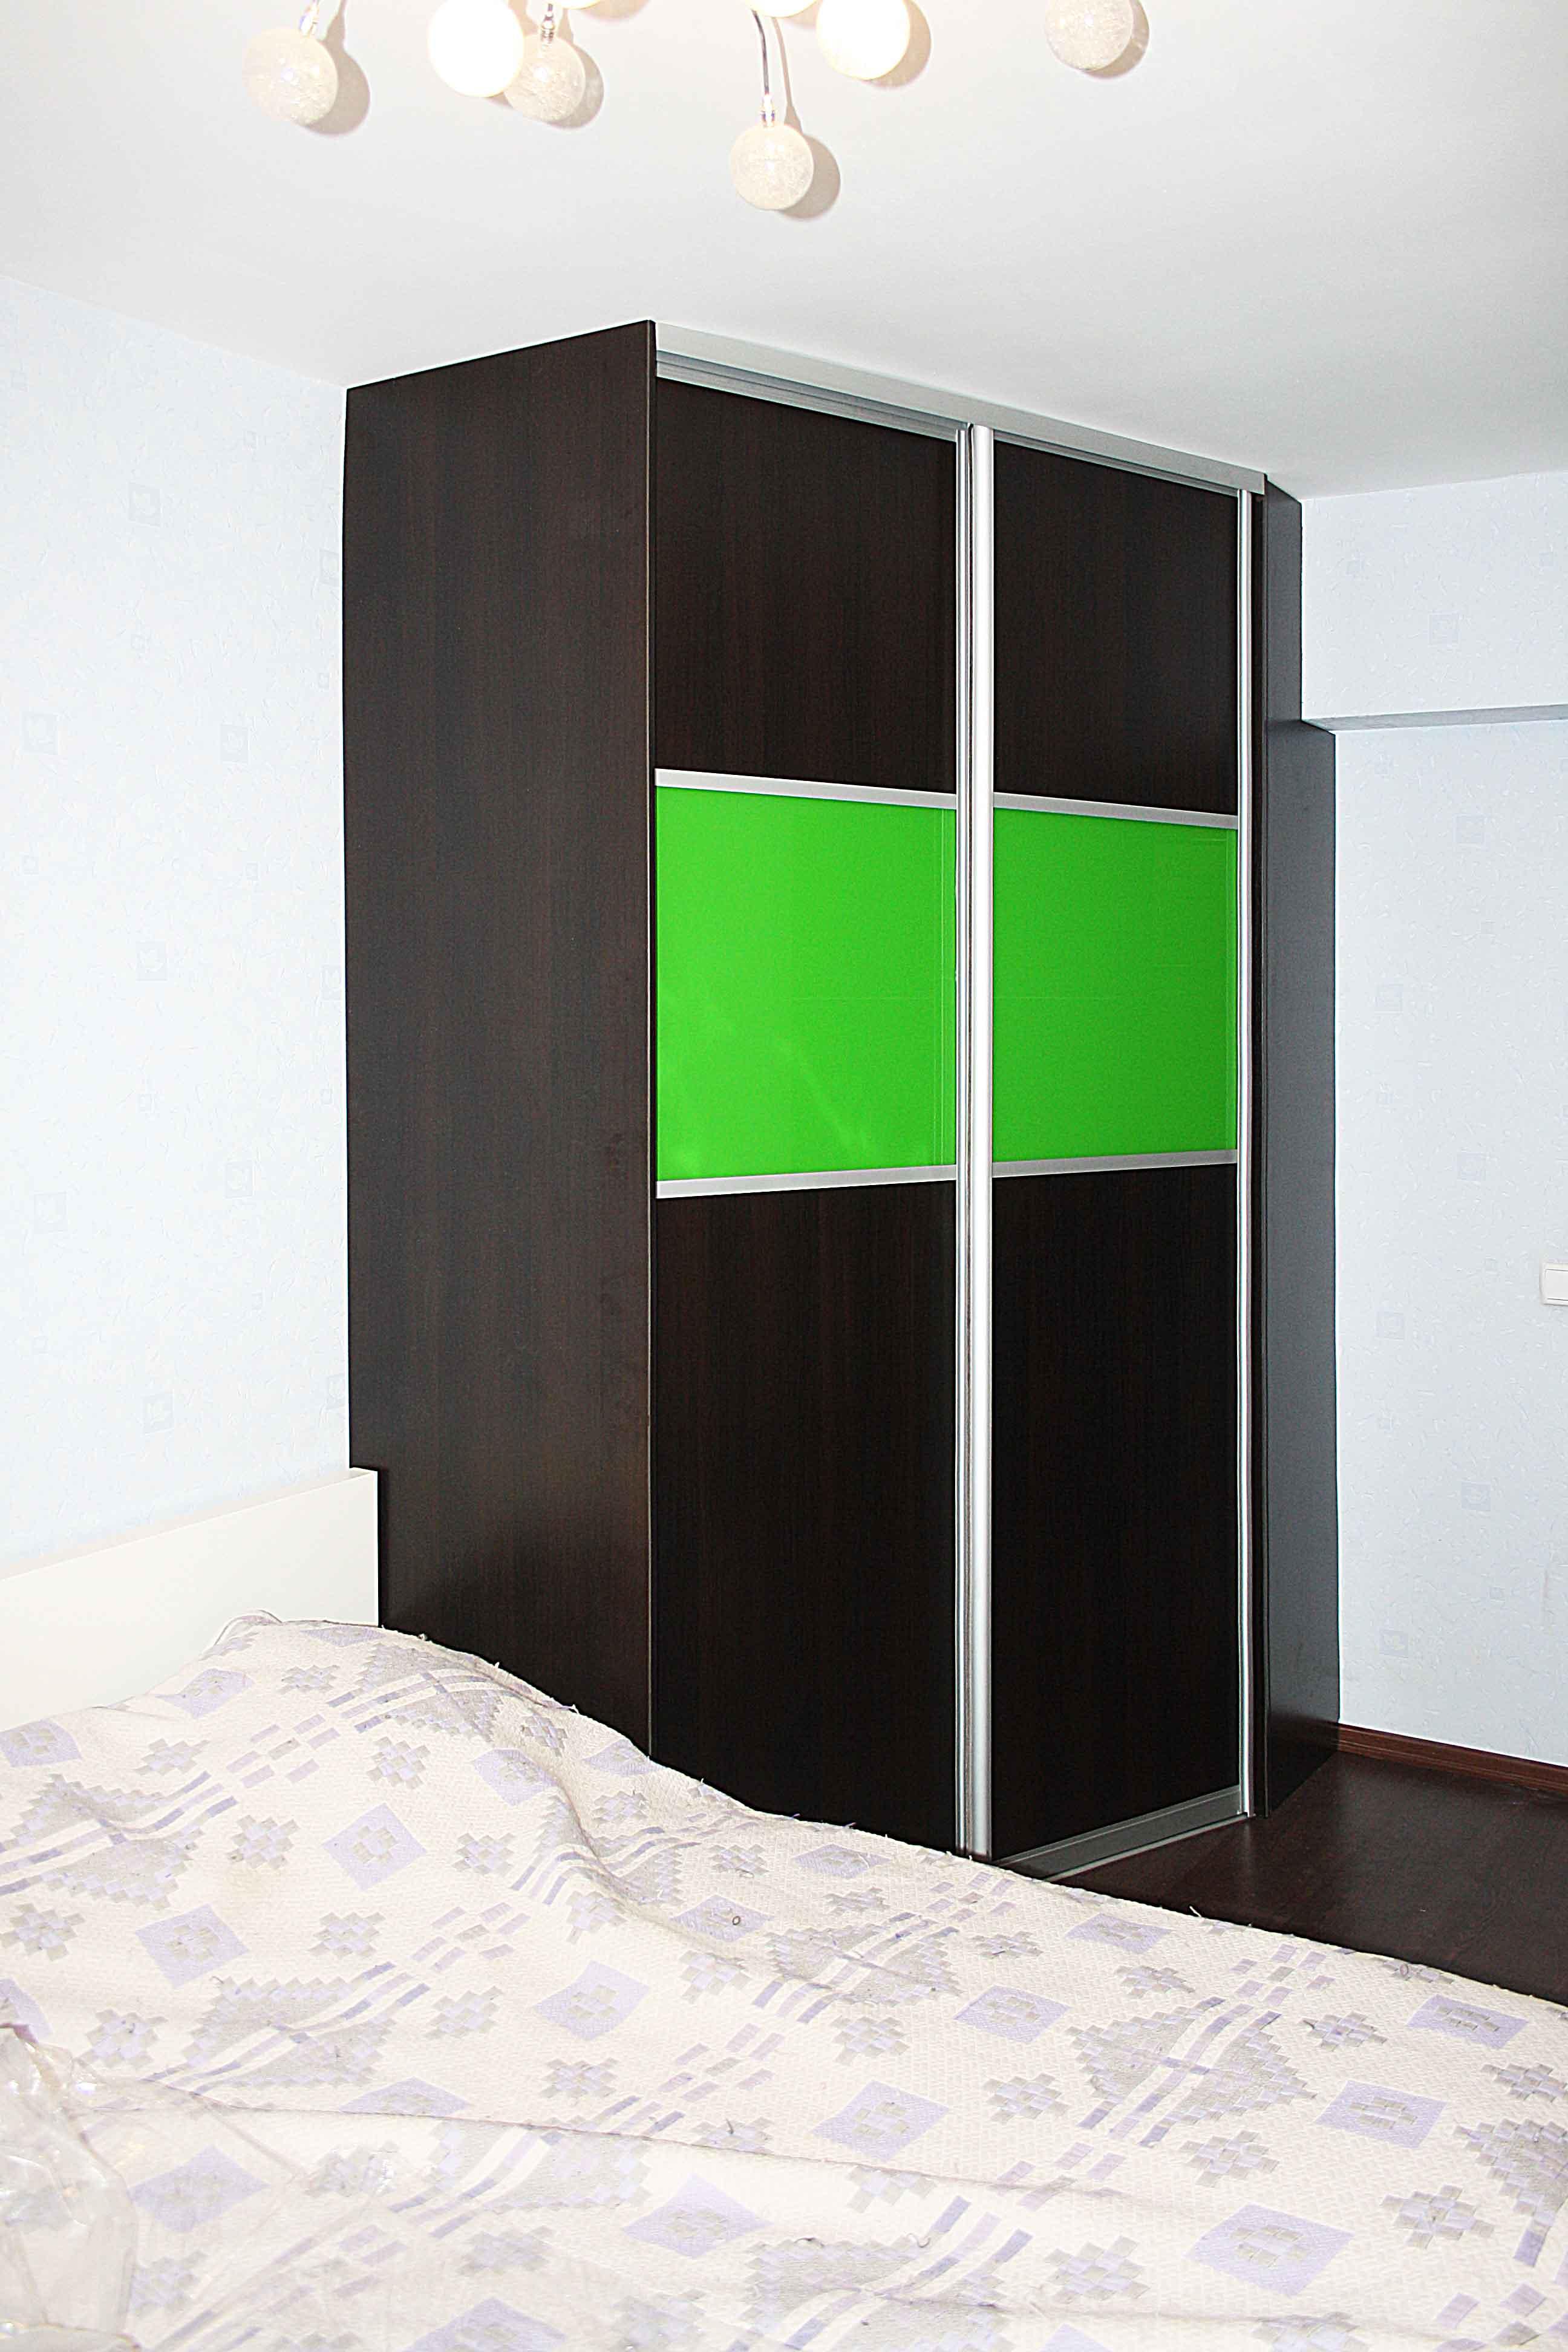 Зелёный шкаф-купе из ЛДСП